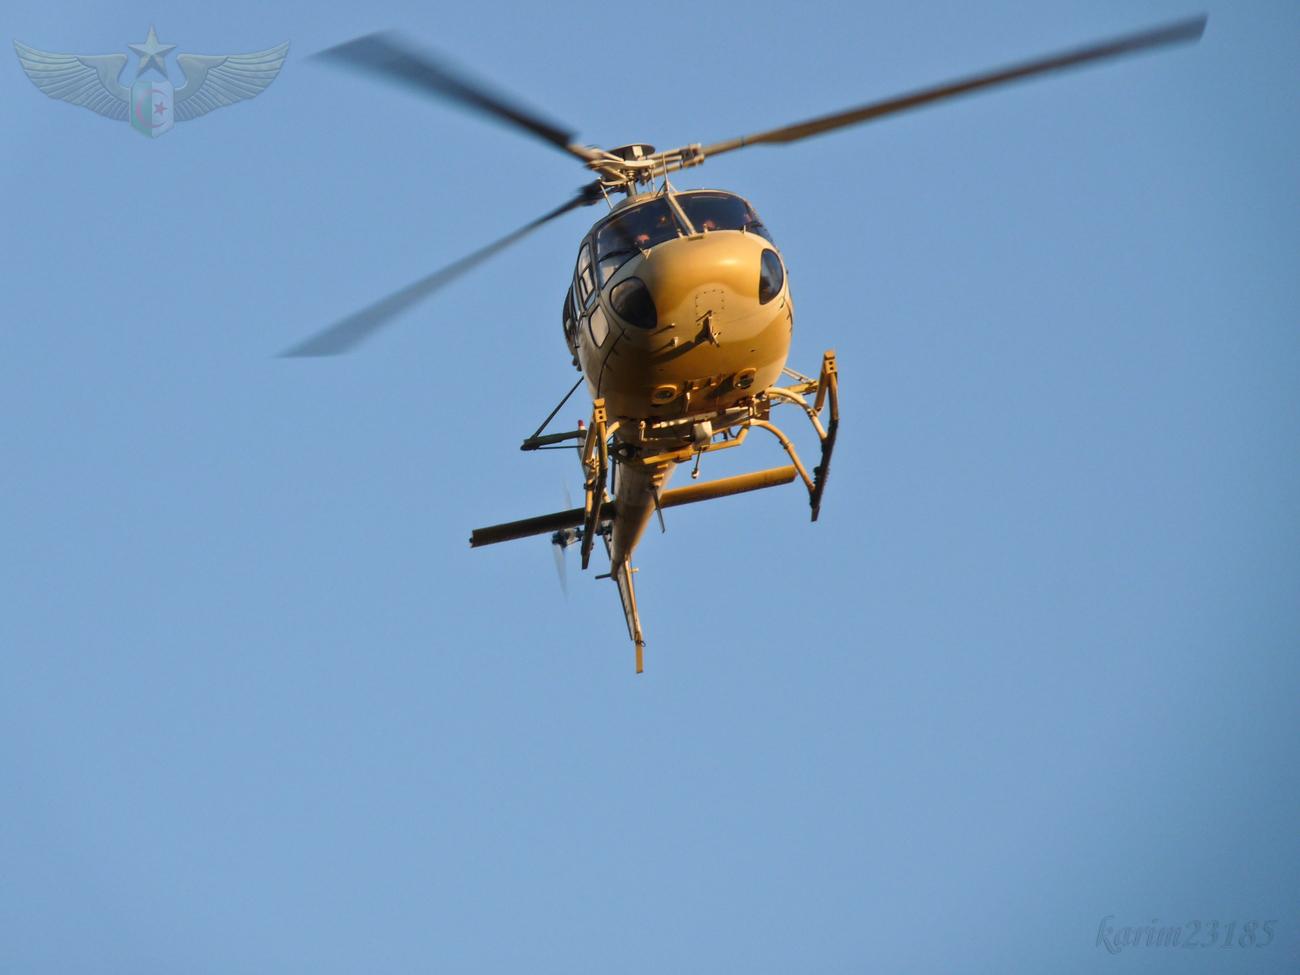 صور مروحيات القوات الجوية الجزائرية Ecureuil/Fennec ] AS-355N2 / AS-555N ] - صفحة 6 27611613675_12246ebe5a_o